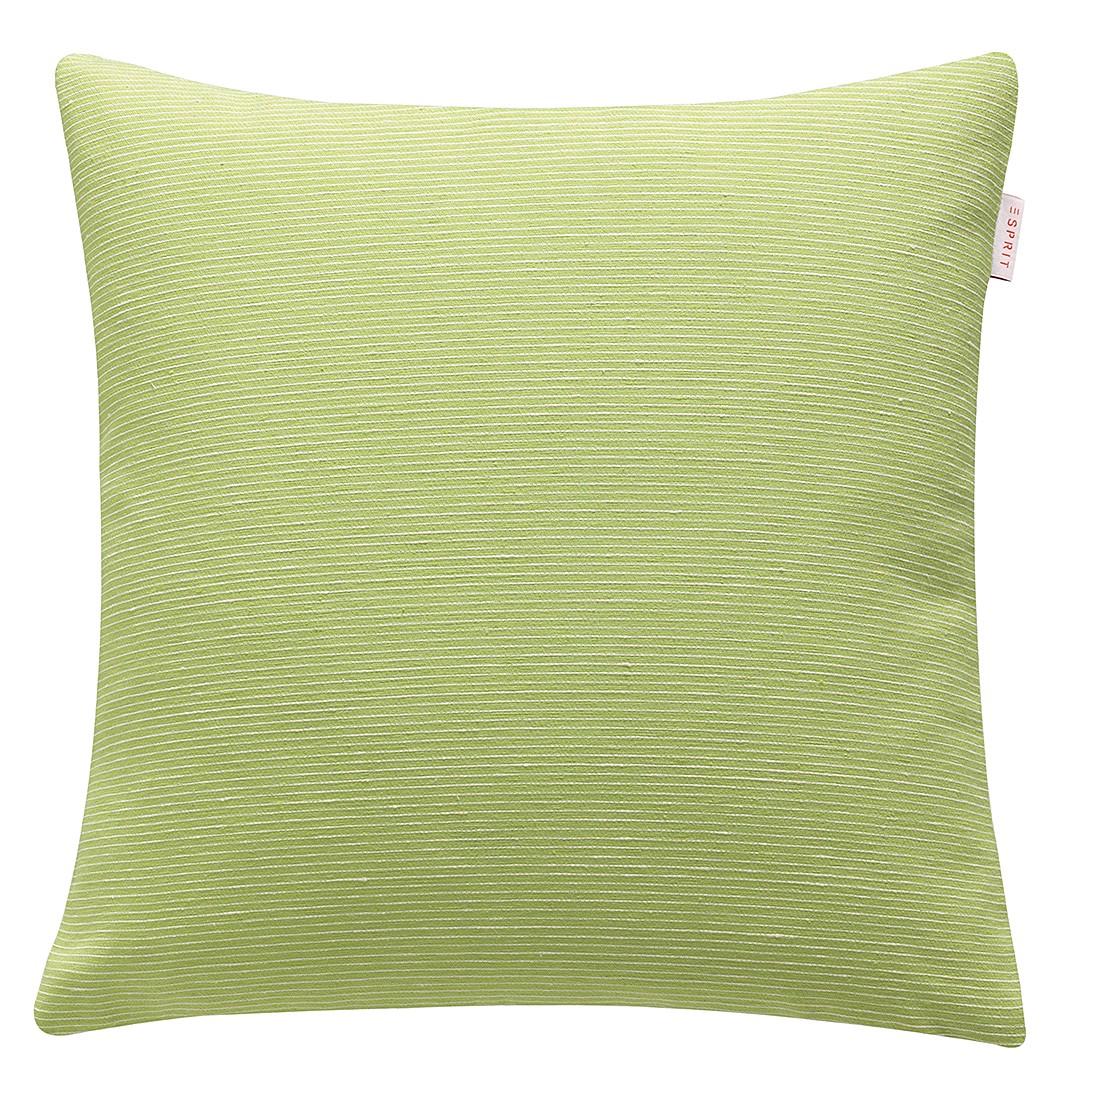 Kissenhülle Needlestripe – Lime, Esprit Home online kaufen